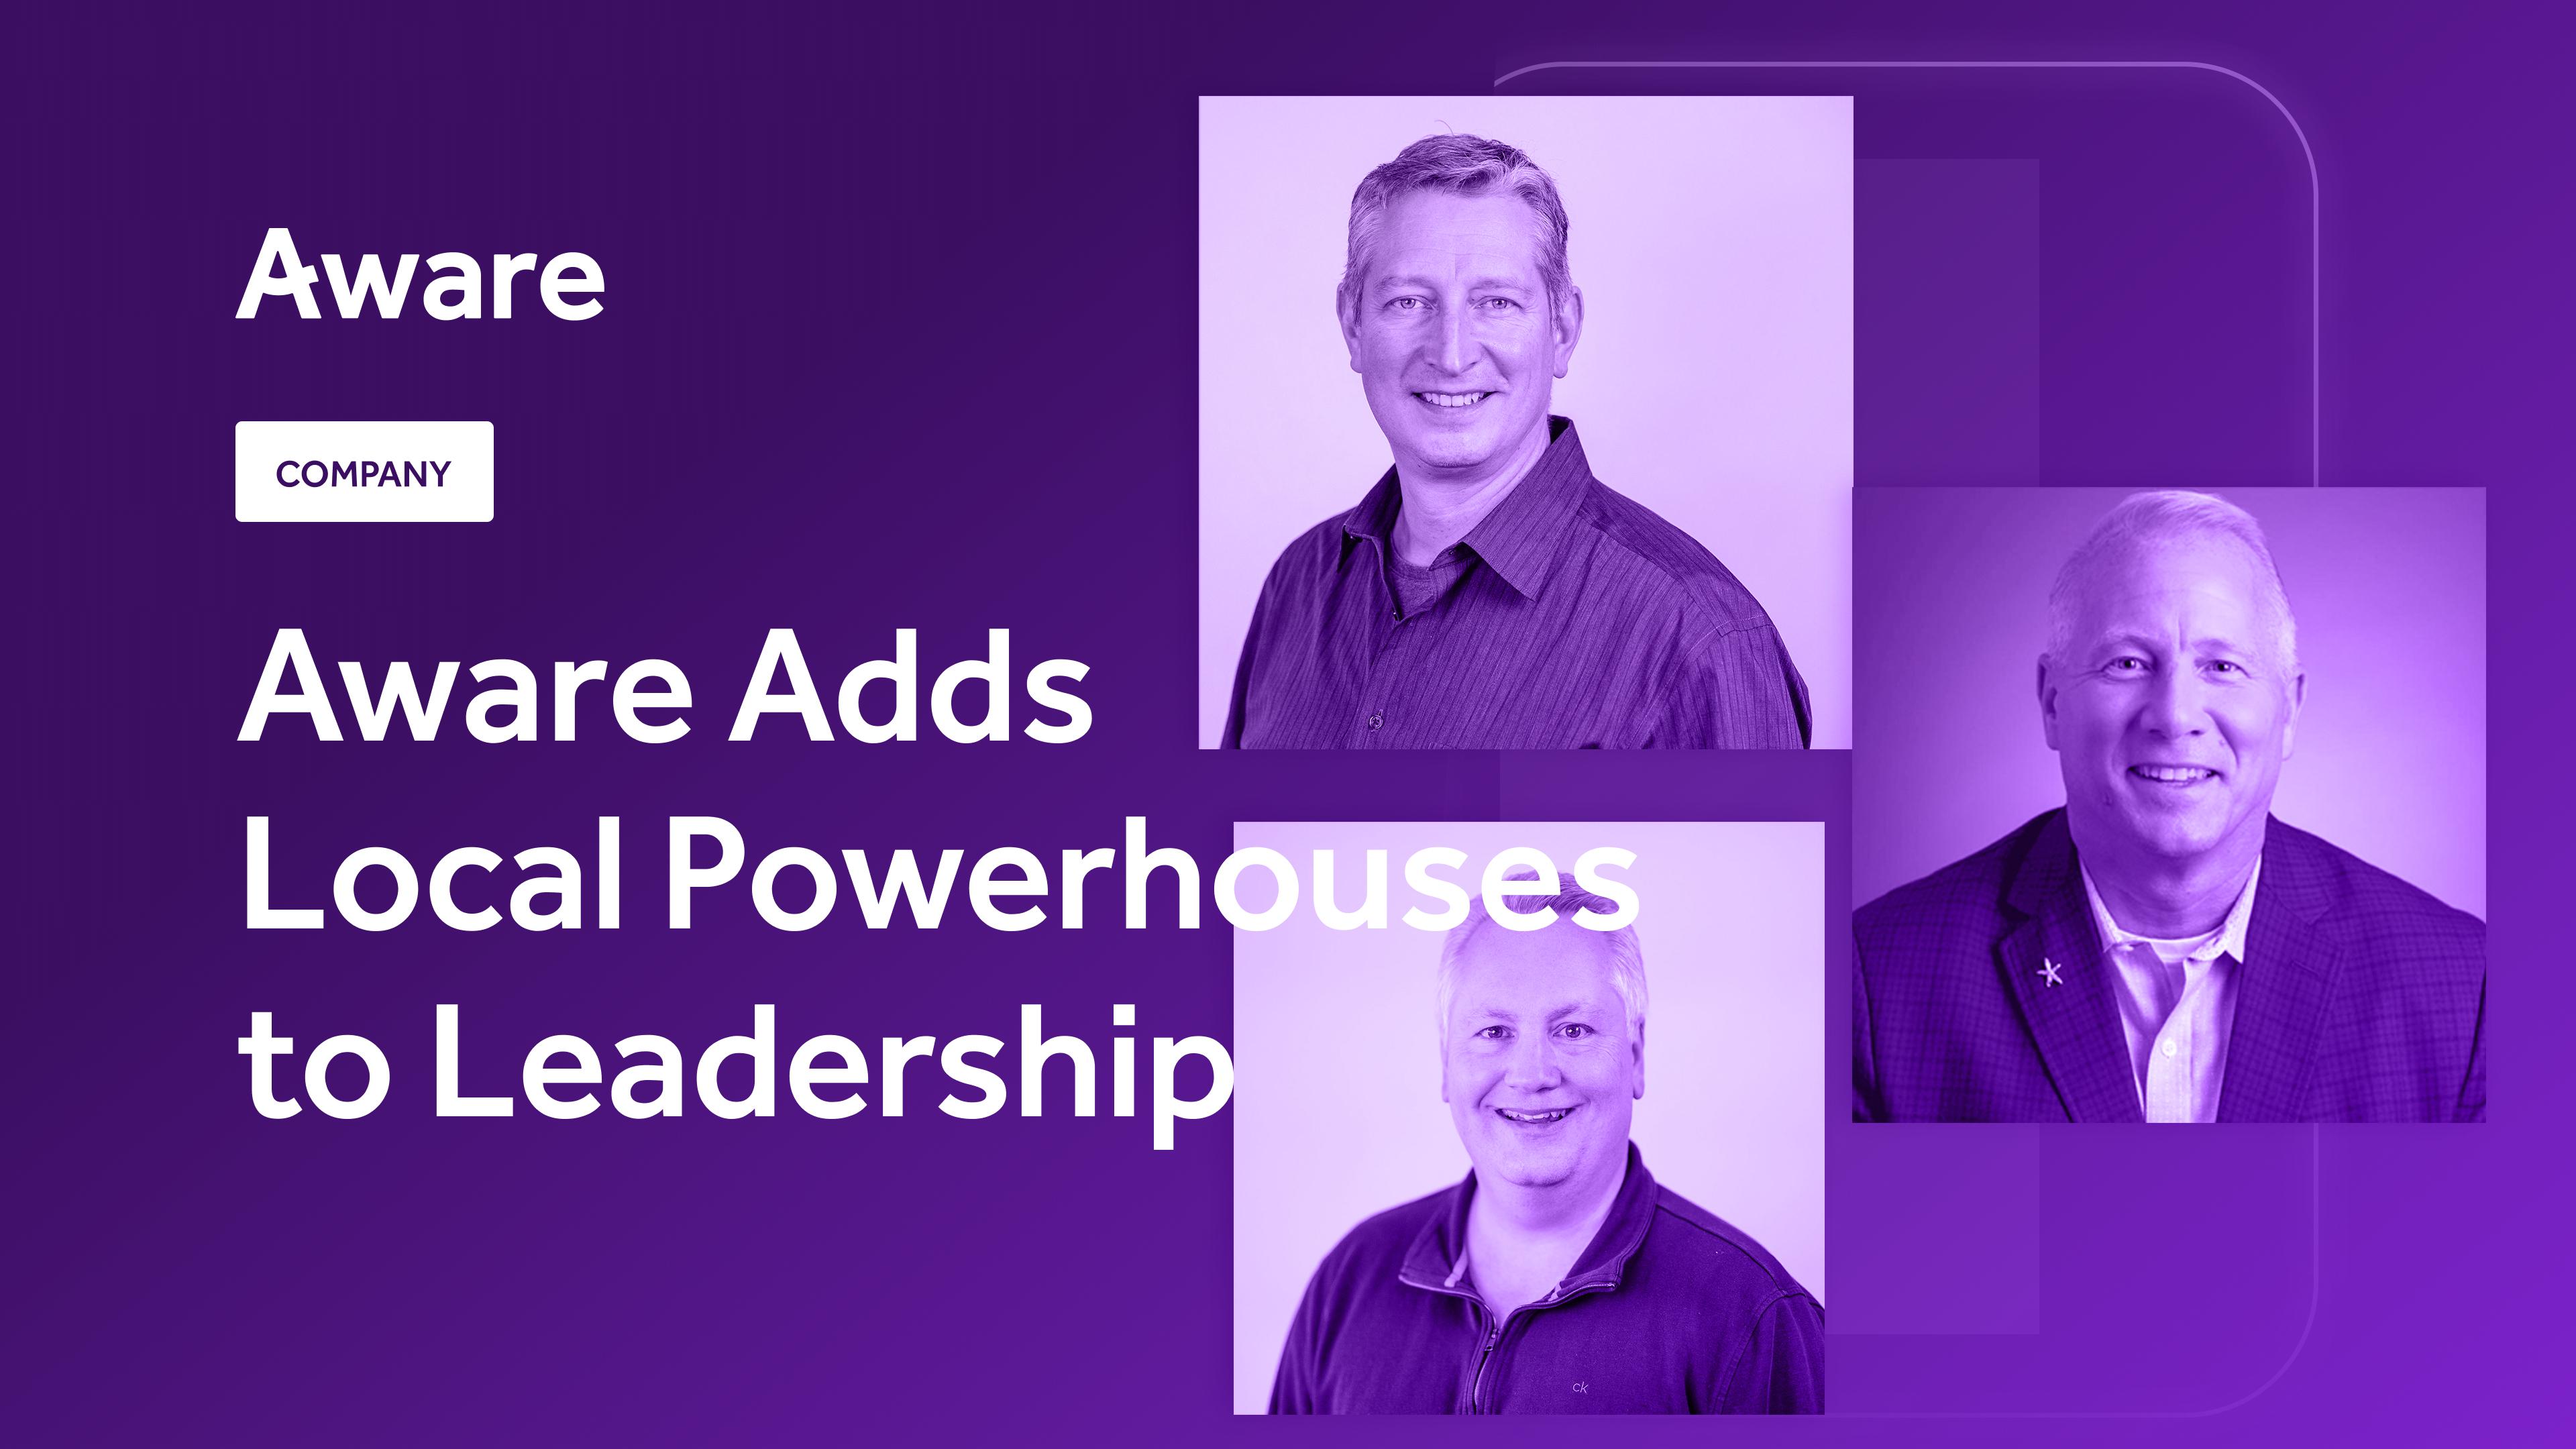 Aware Adds Local Powerhouses to Leadership